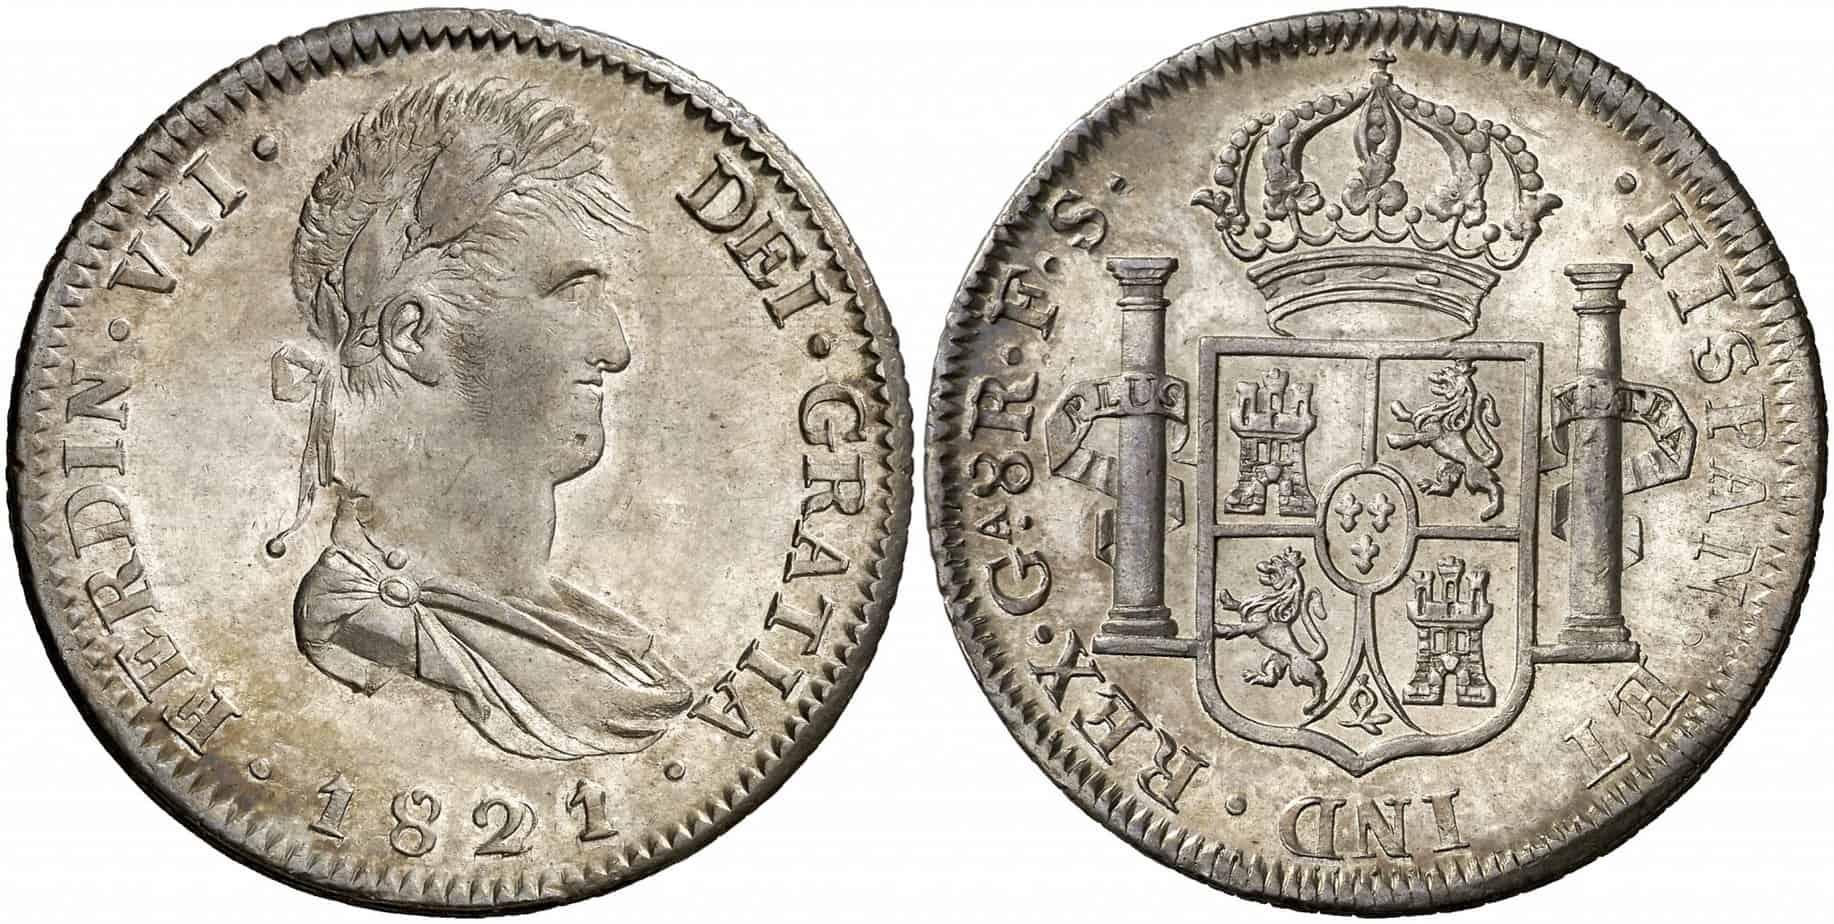 8 reales Guadelajara 1821